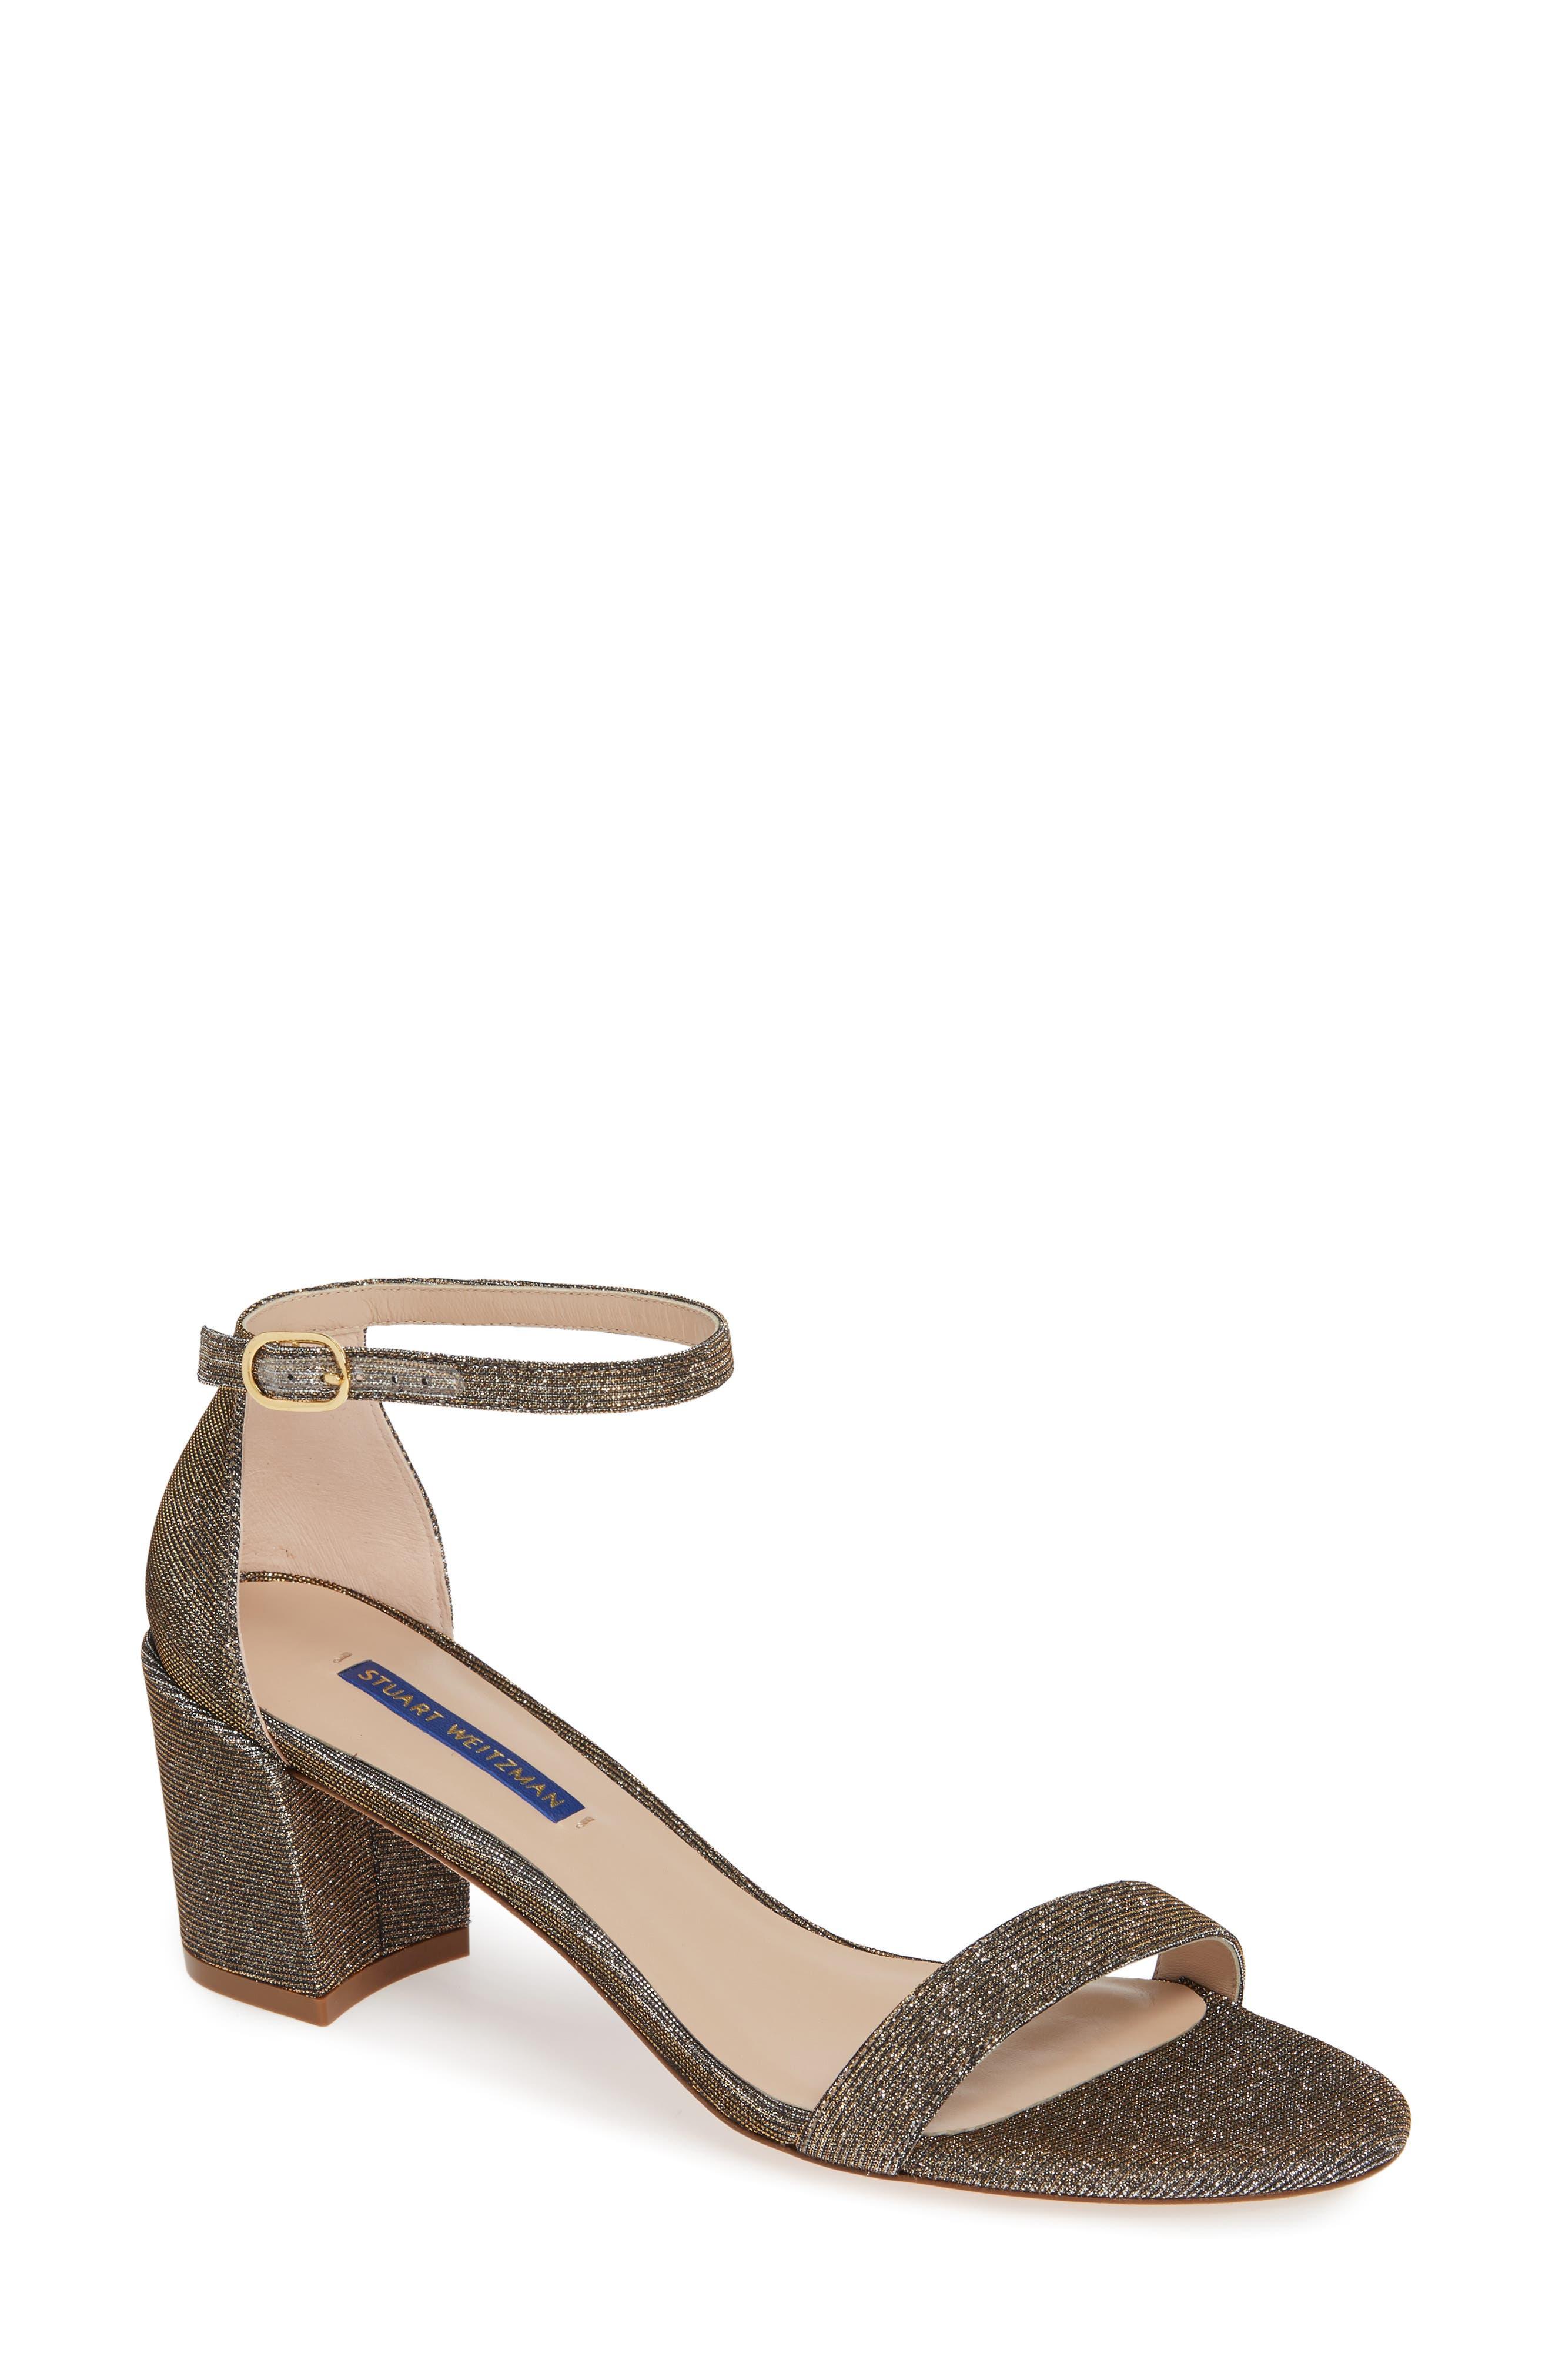 STUART WEITZMAN, Simple Ankle Strap Sandal, Main thumbnail 1, color, GOLD NIGHTTIME